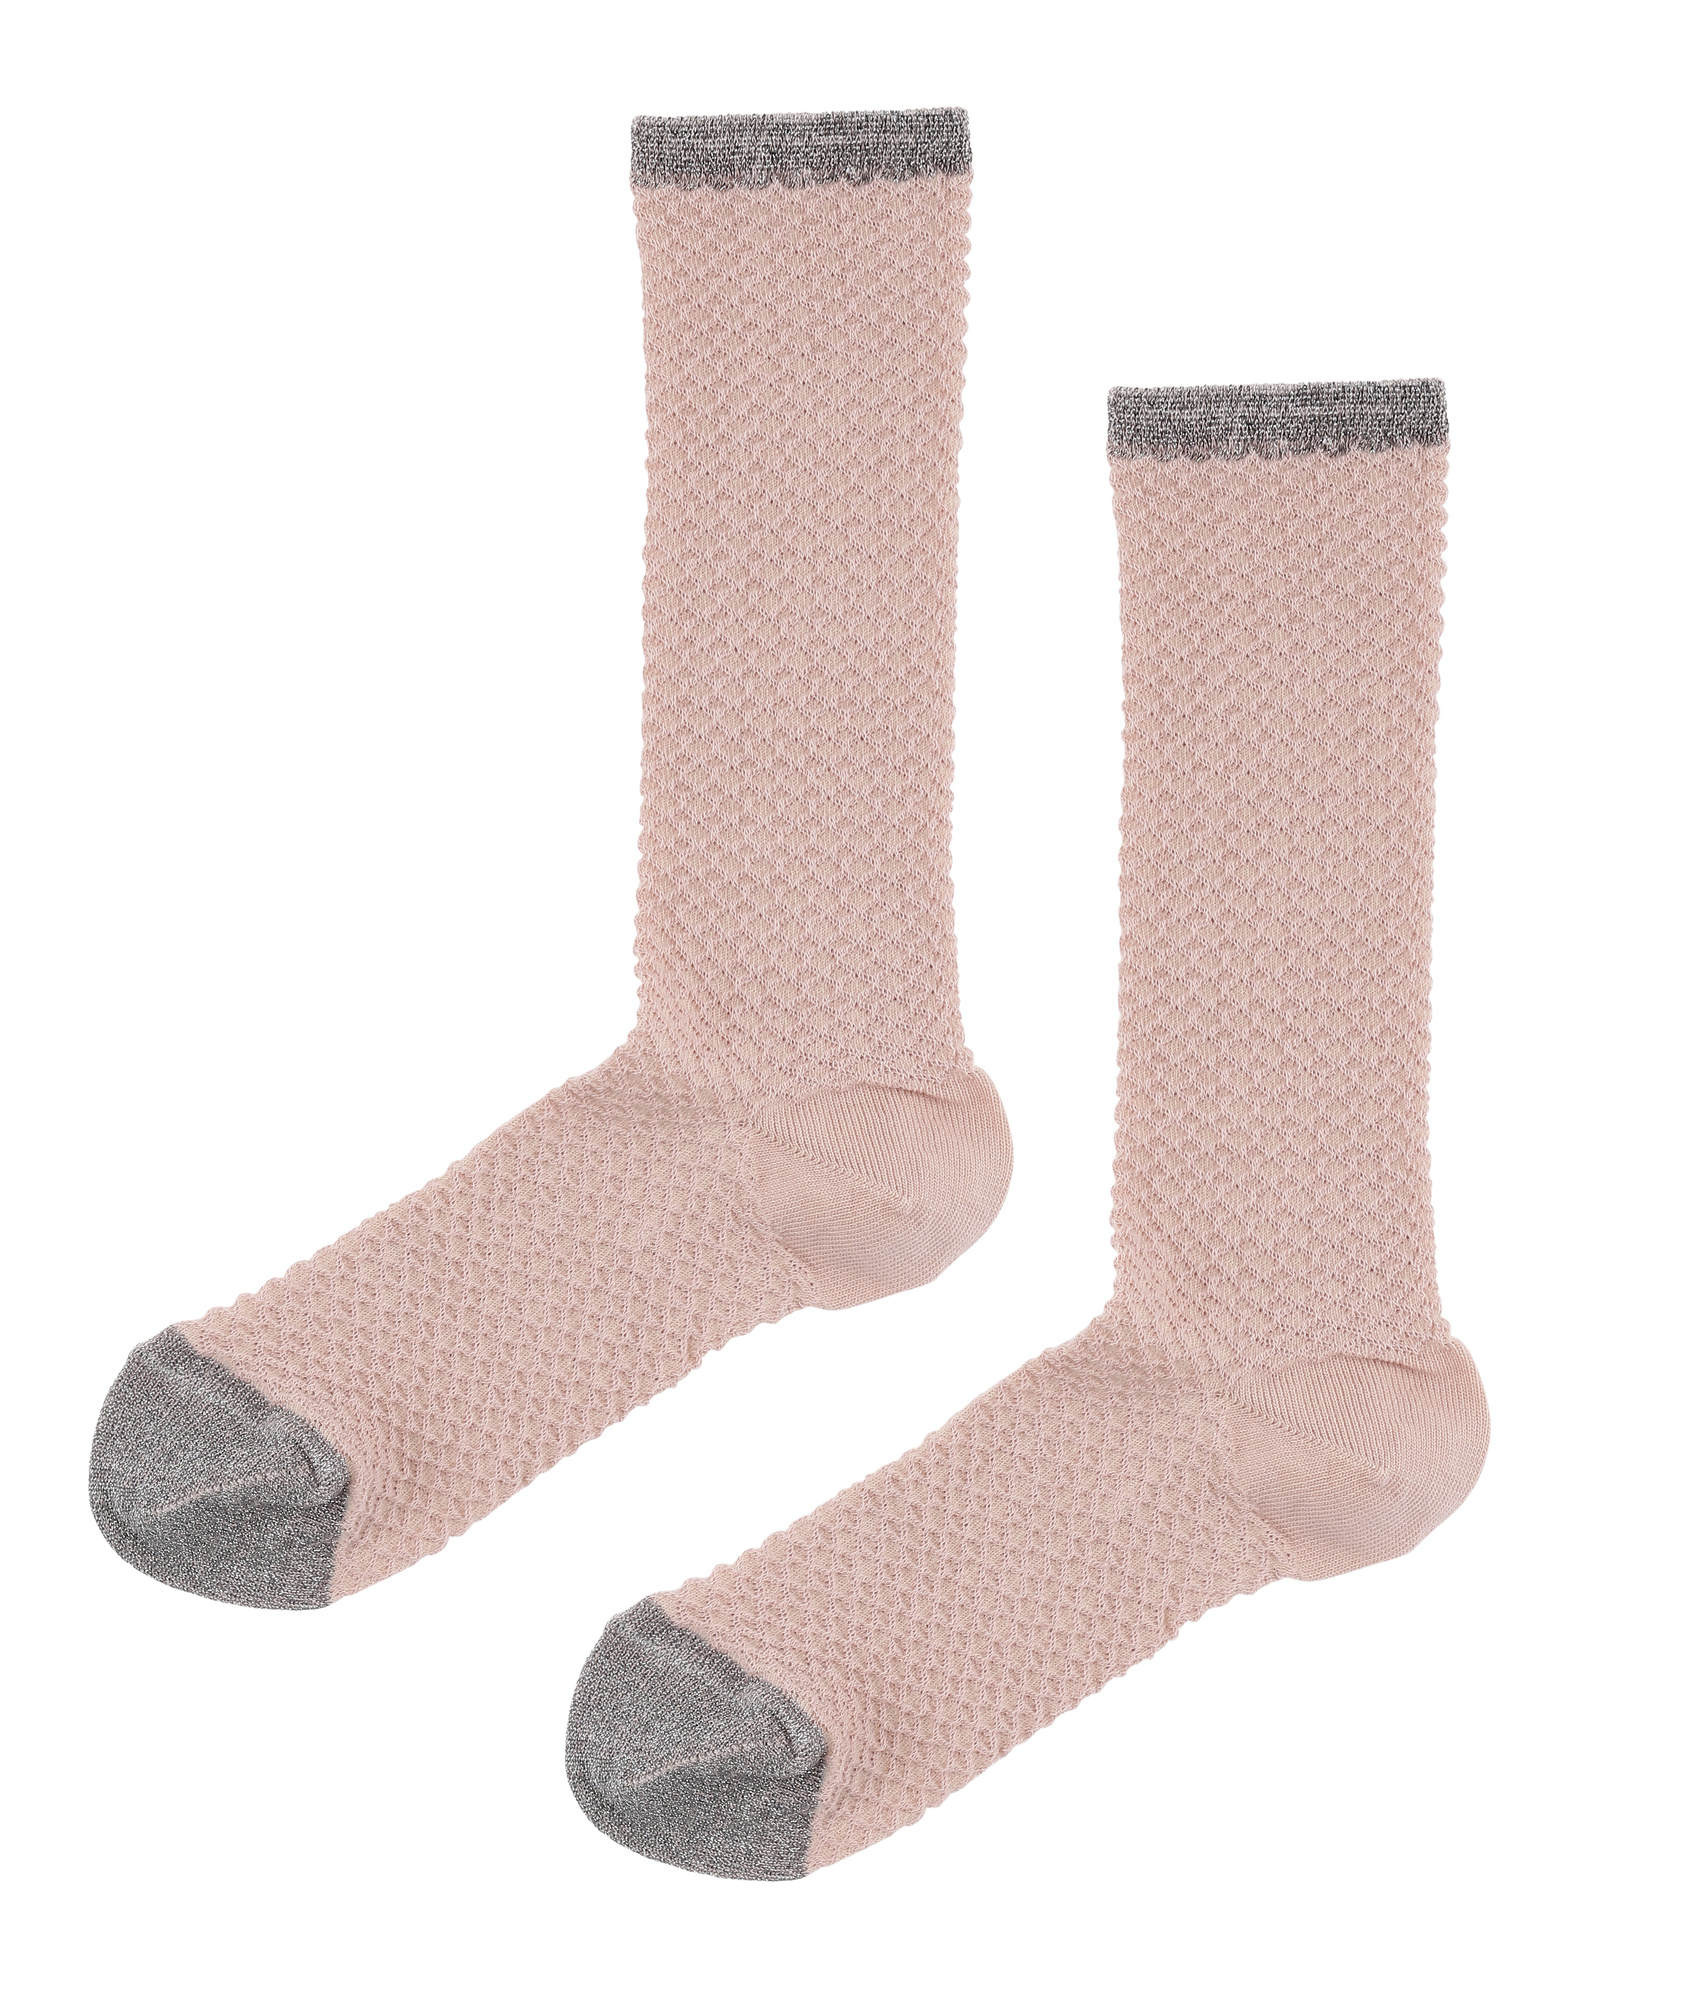 custommade strømper